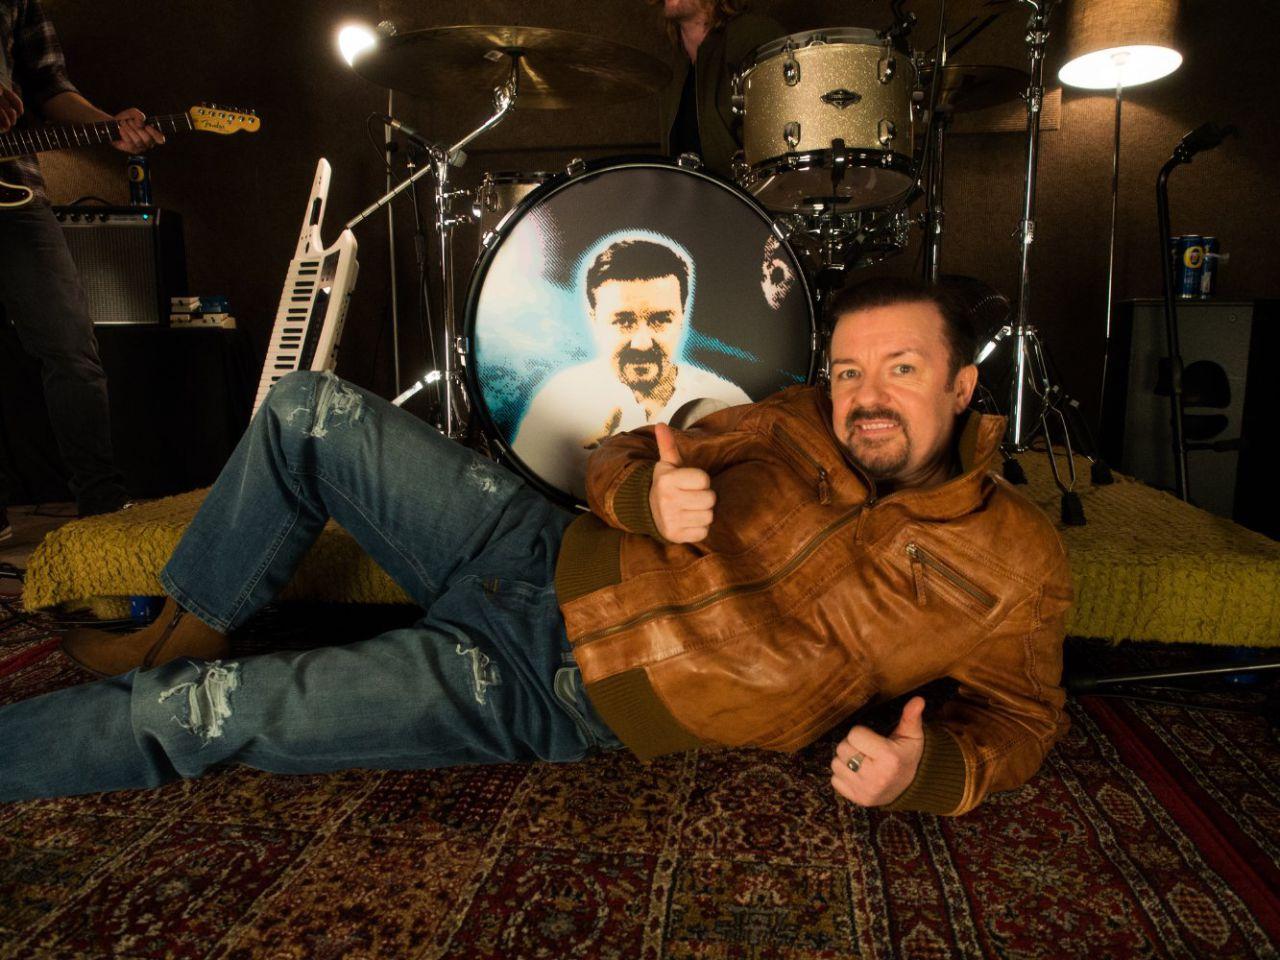 Ricky Gervais David Brent